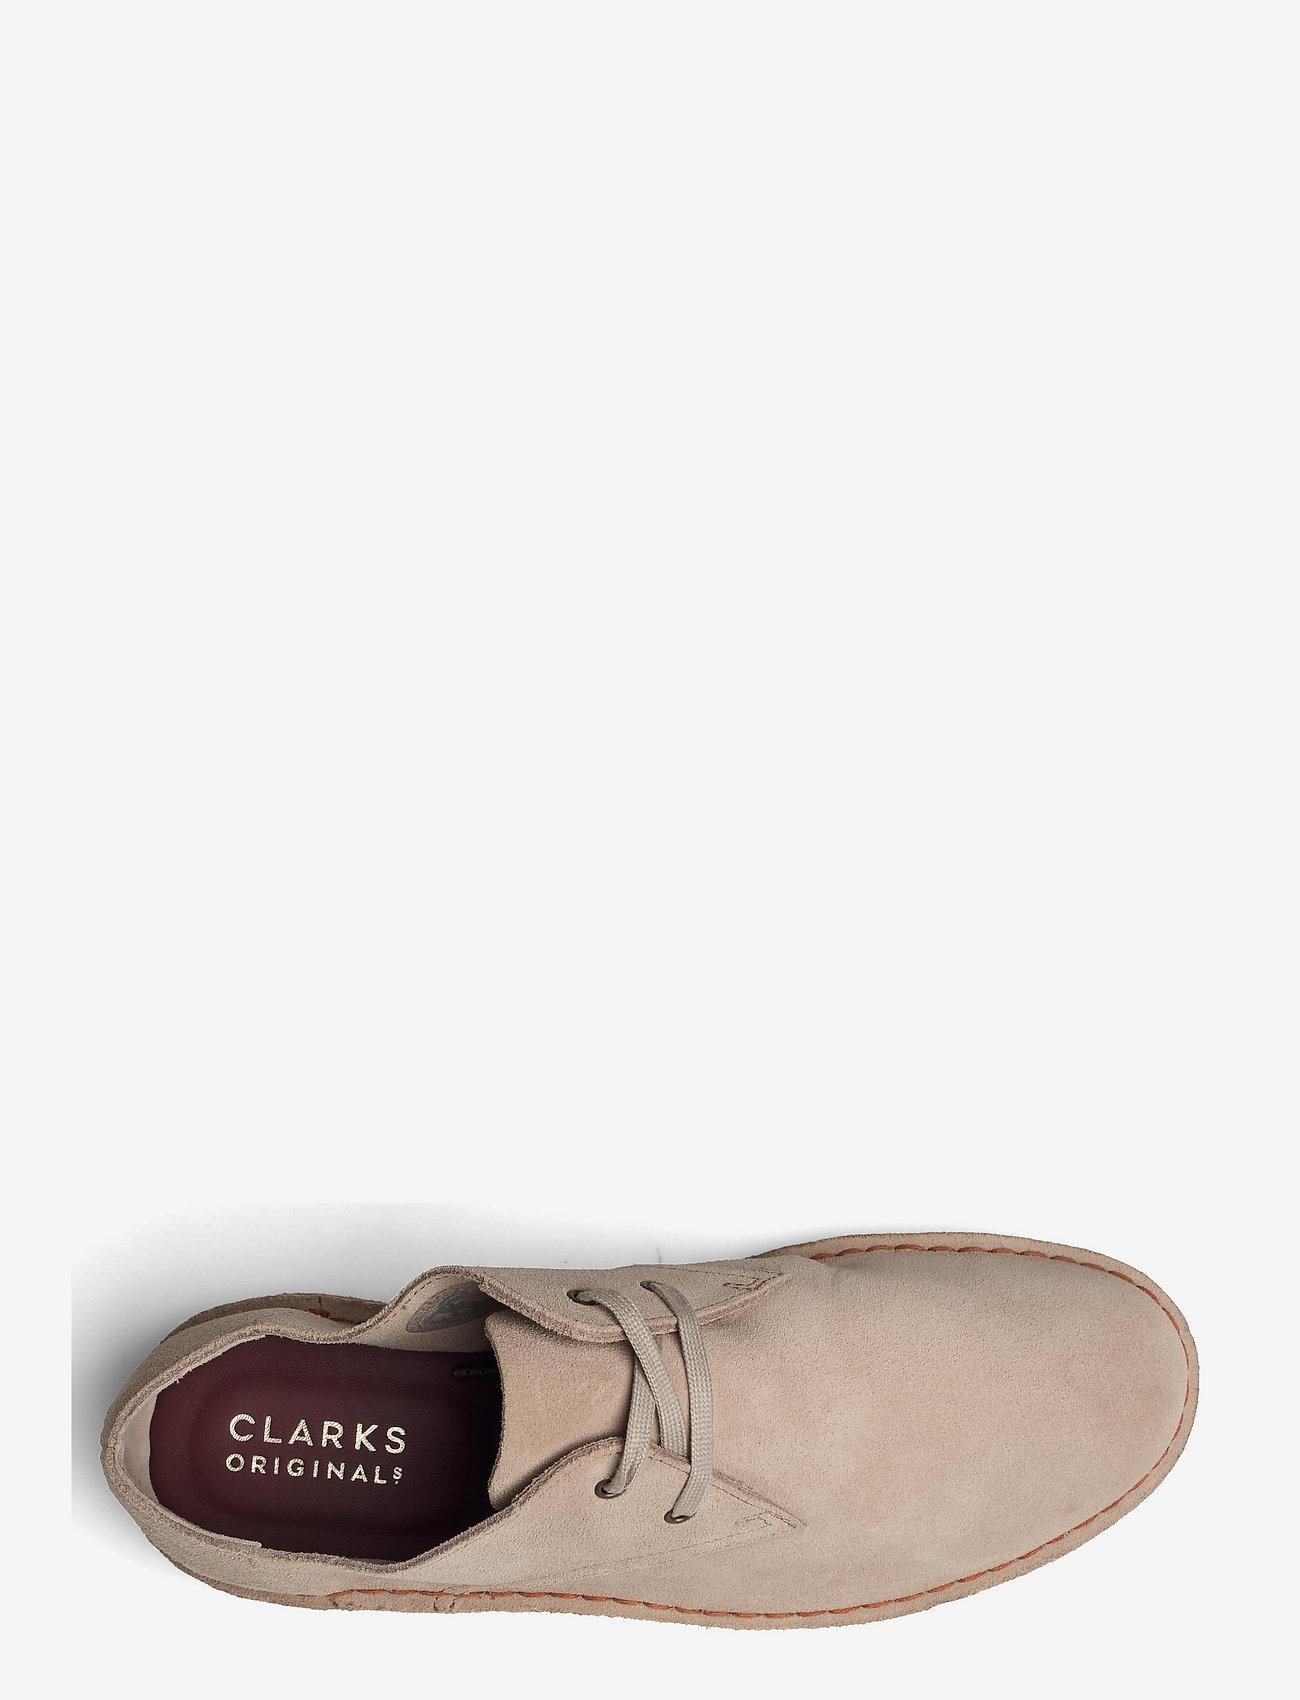 Clarks Originals - Desert Khan - Ökenkängor - sand suede - 3